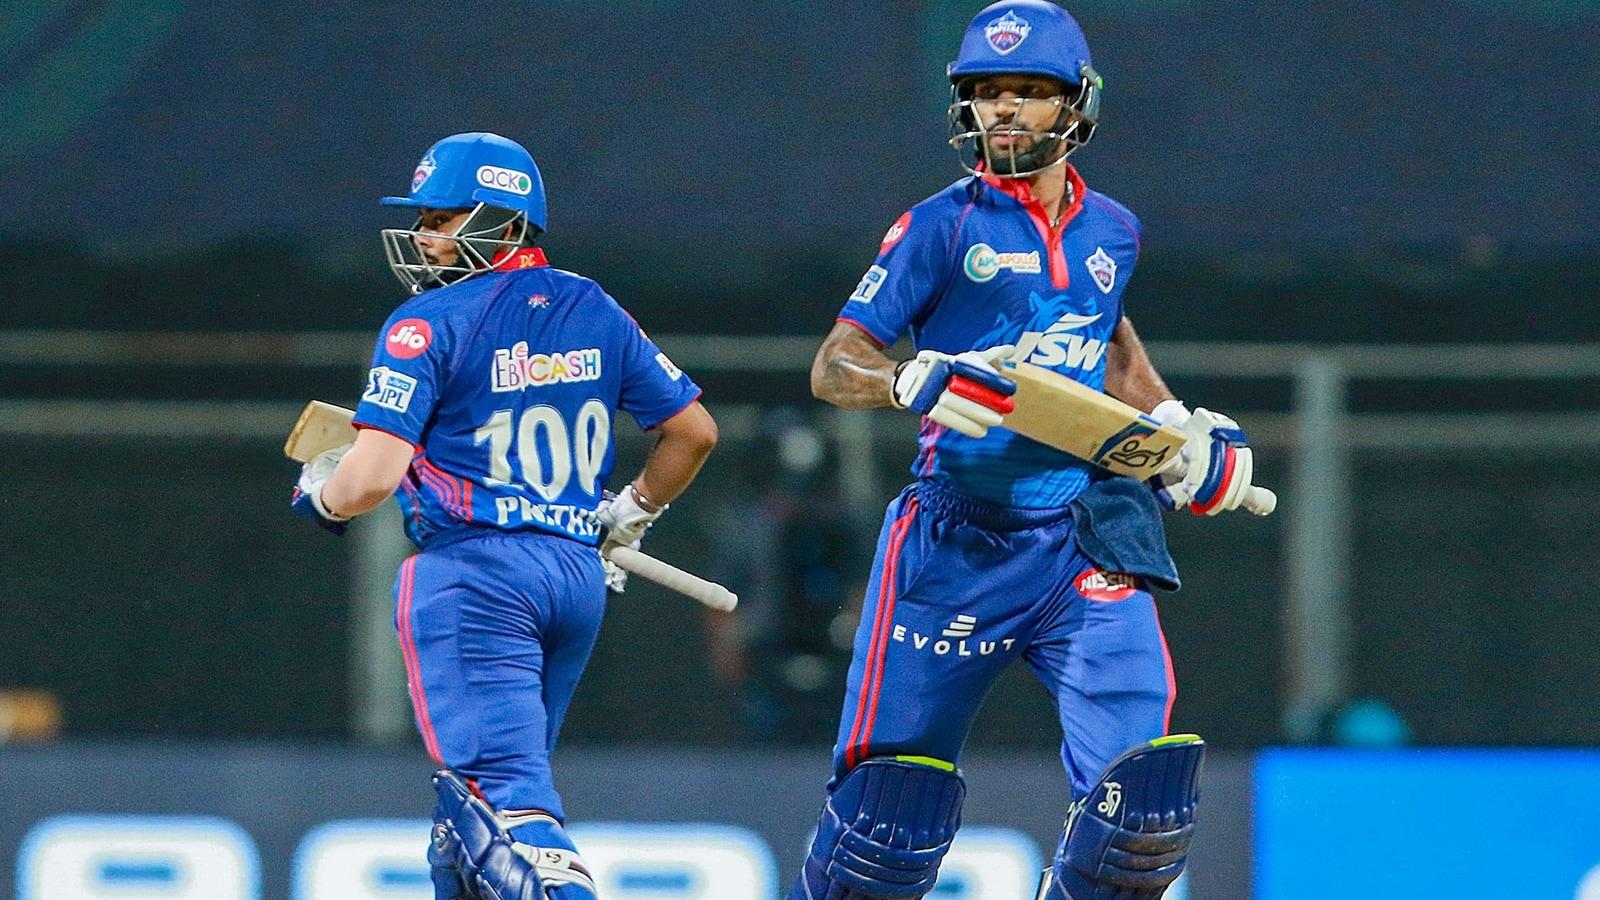 IPL 2021: He has come back as a champion: DC's Shikhar Dhawan praises Prithvi Shaw's show against CSK | Cricket - Hindustan Times